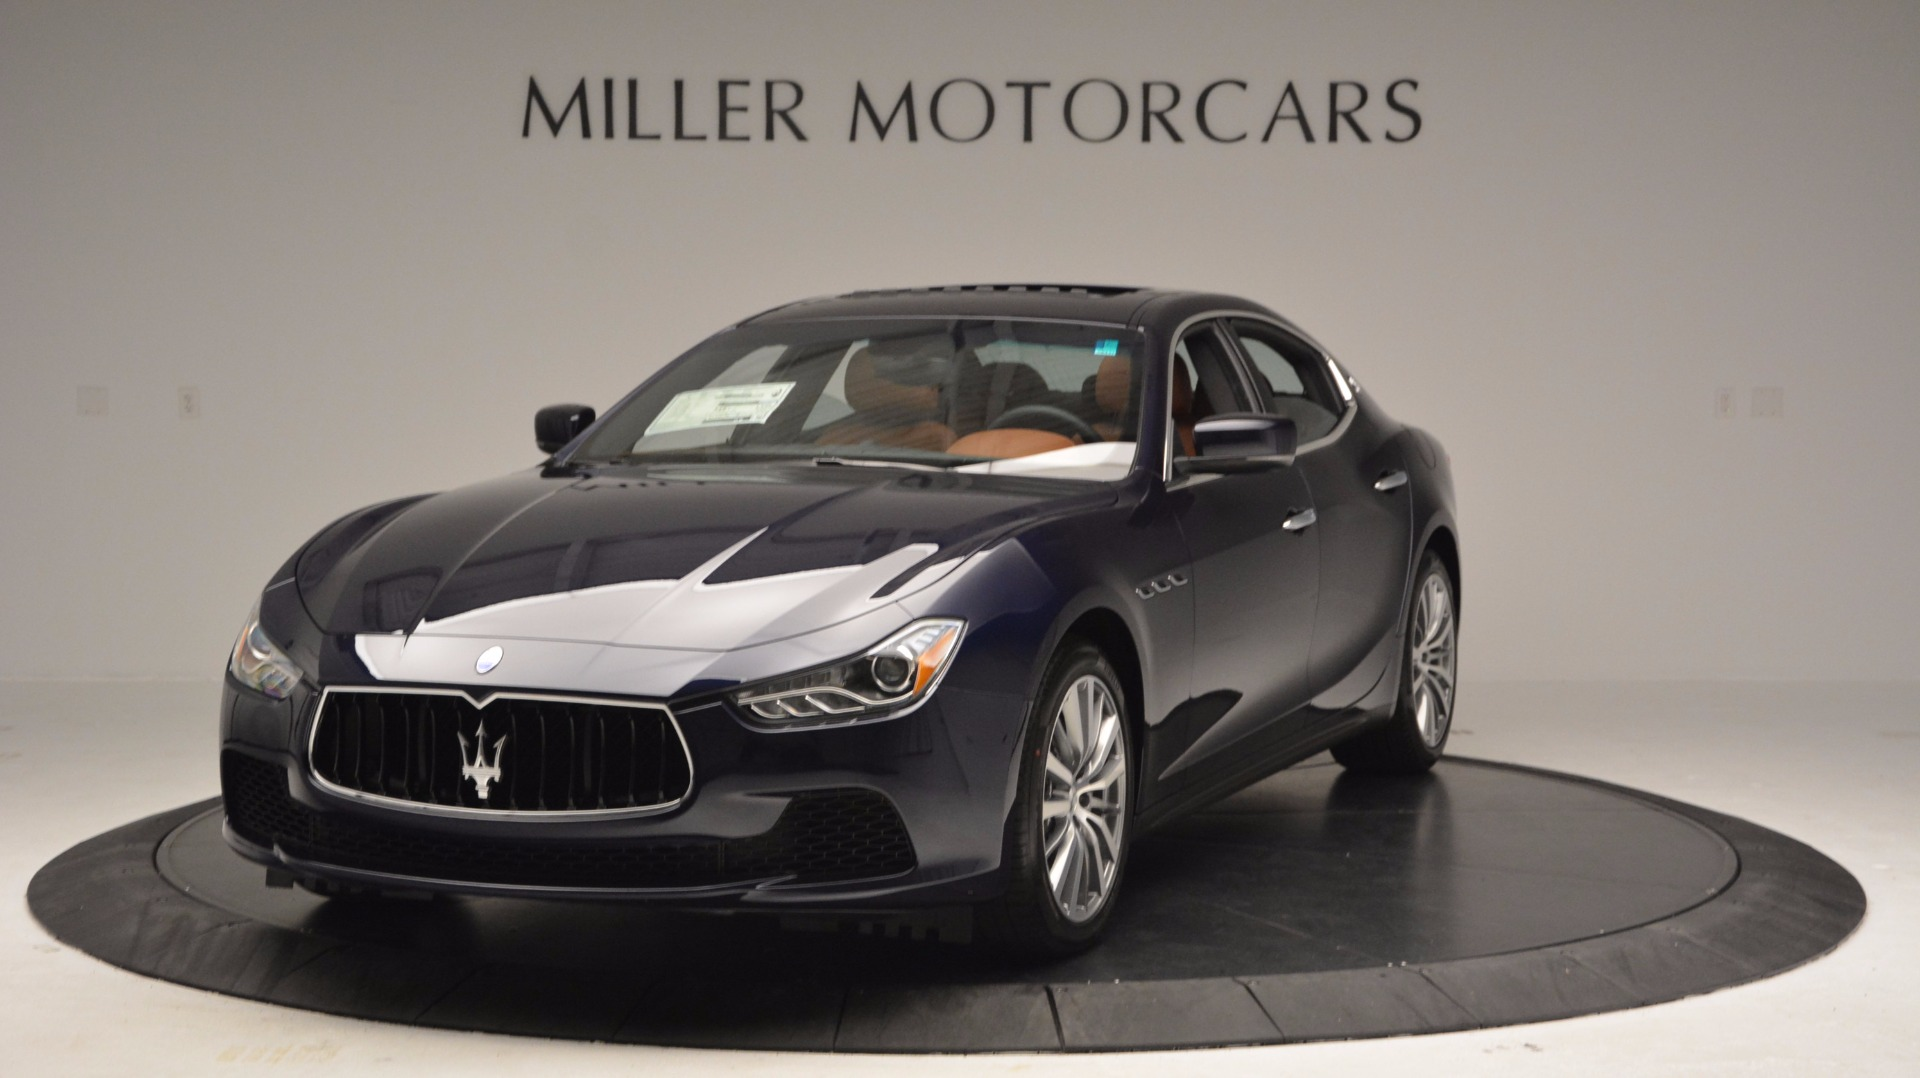 New 2017 Maserati Ghibli S Q4 For Sale In Greenwich, CT. Alfa Romeo of Greenwich, M1854 1119_main